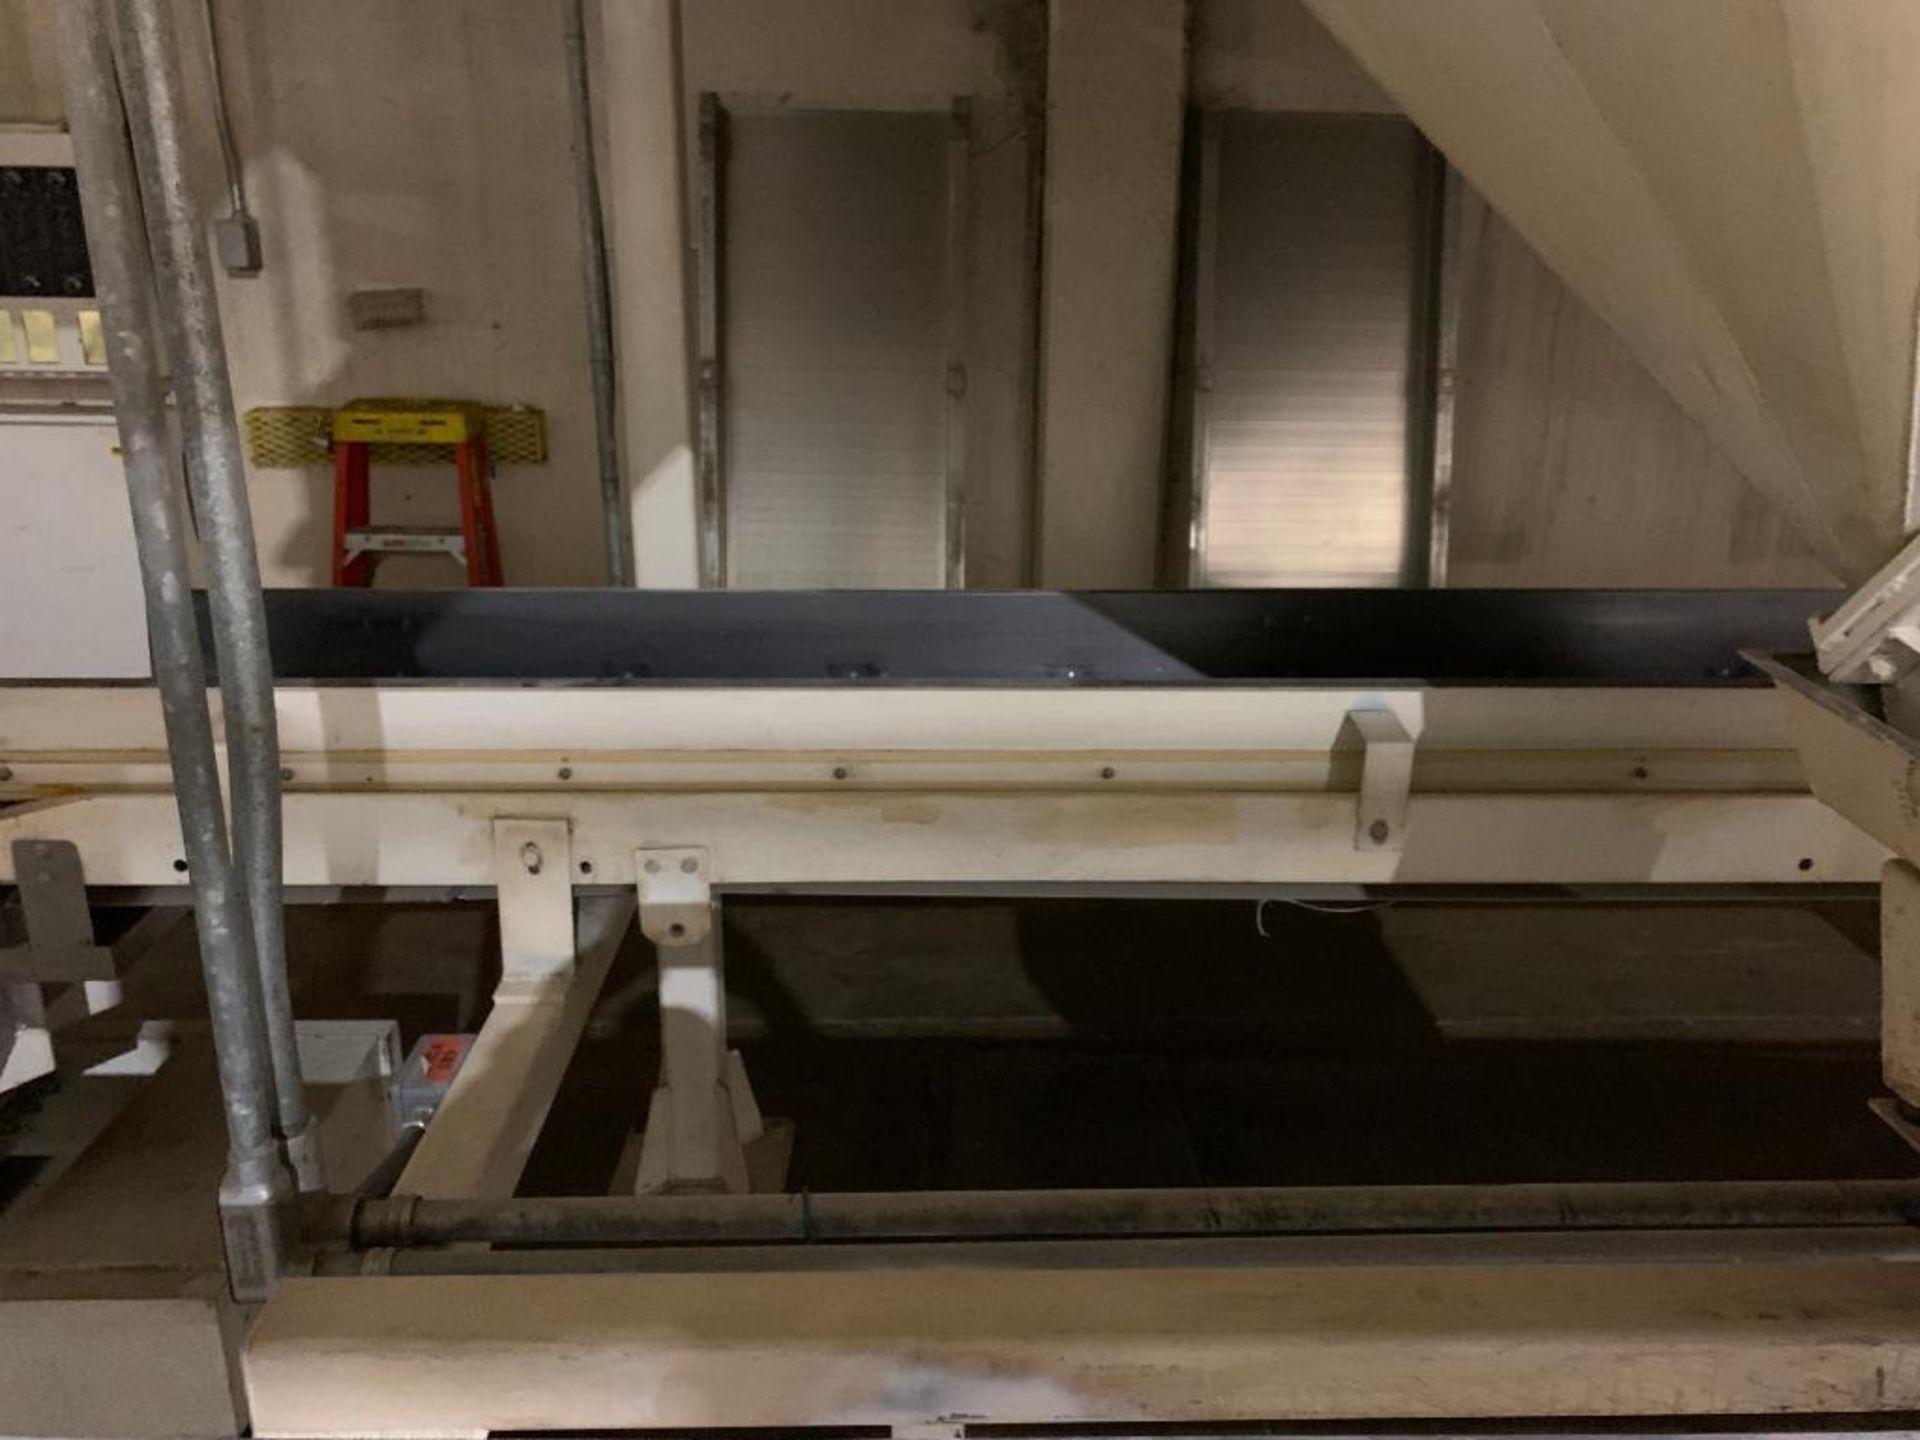 Aseeco mild steel cone bottom bulk storage bin - Image 14 of 23